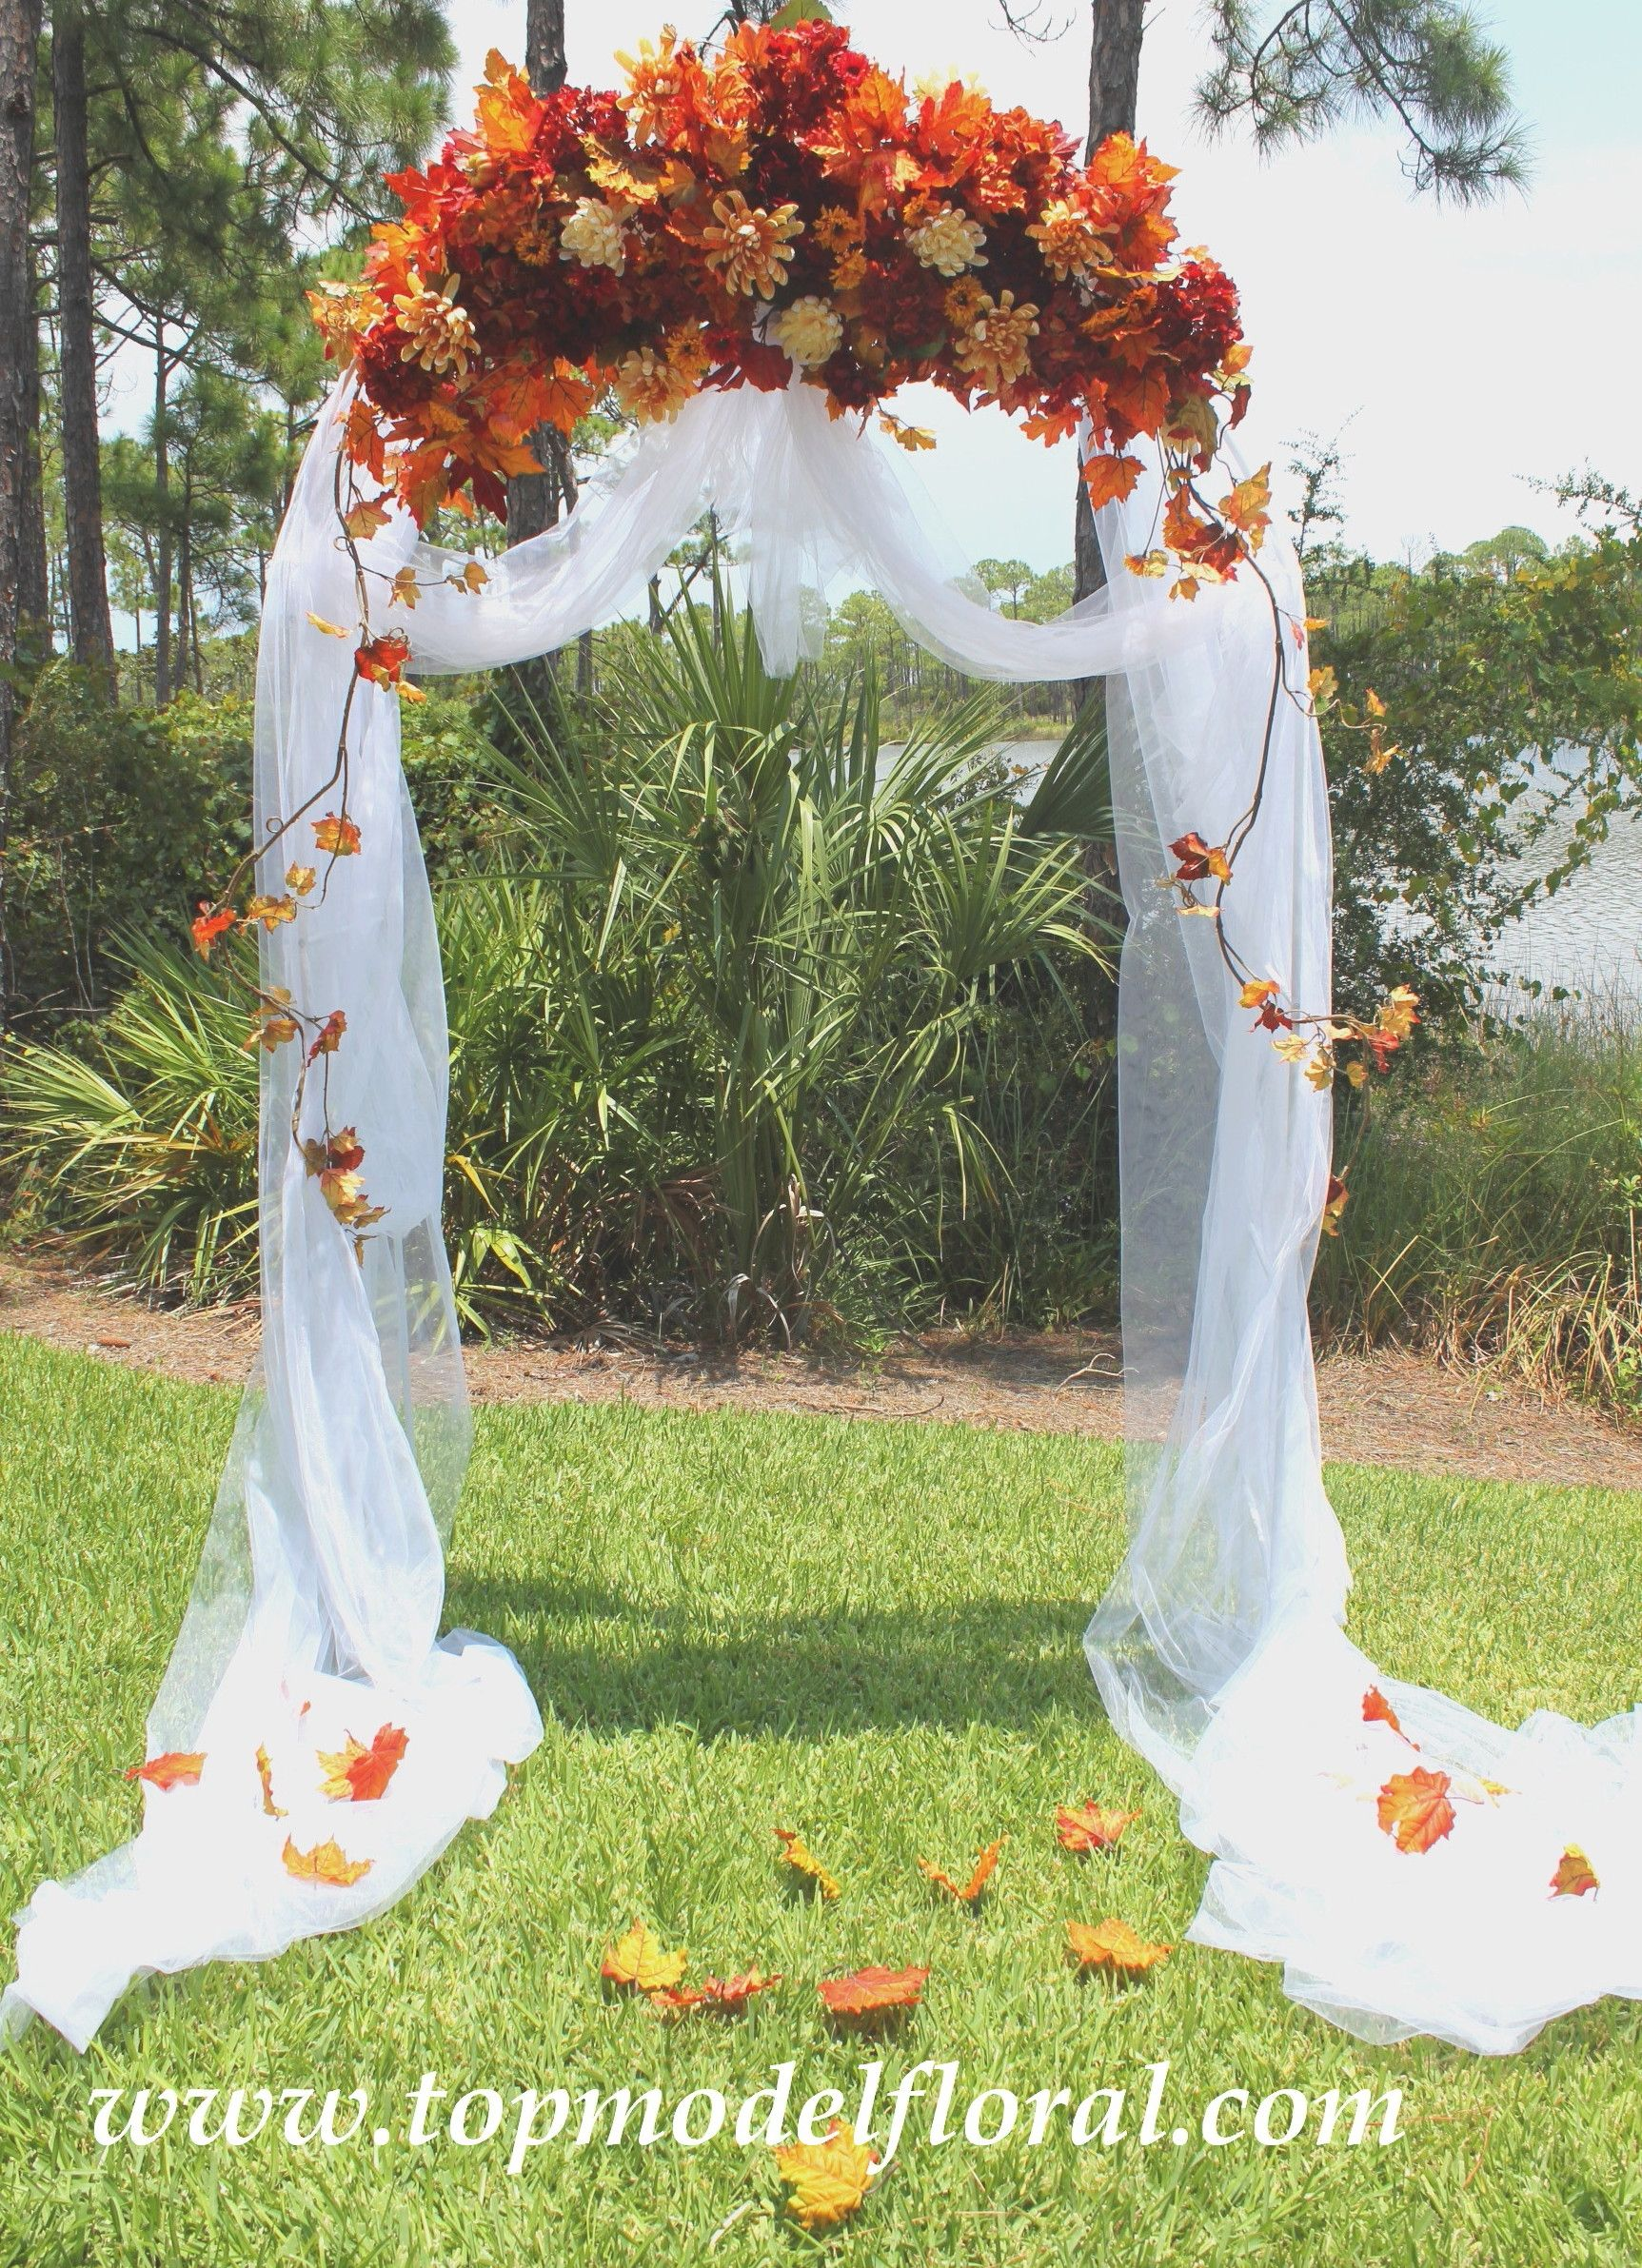 Diy Wedding Arch Decorations Wedding Arch Decorated With Flowers